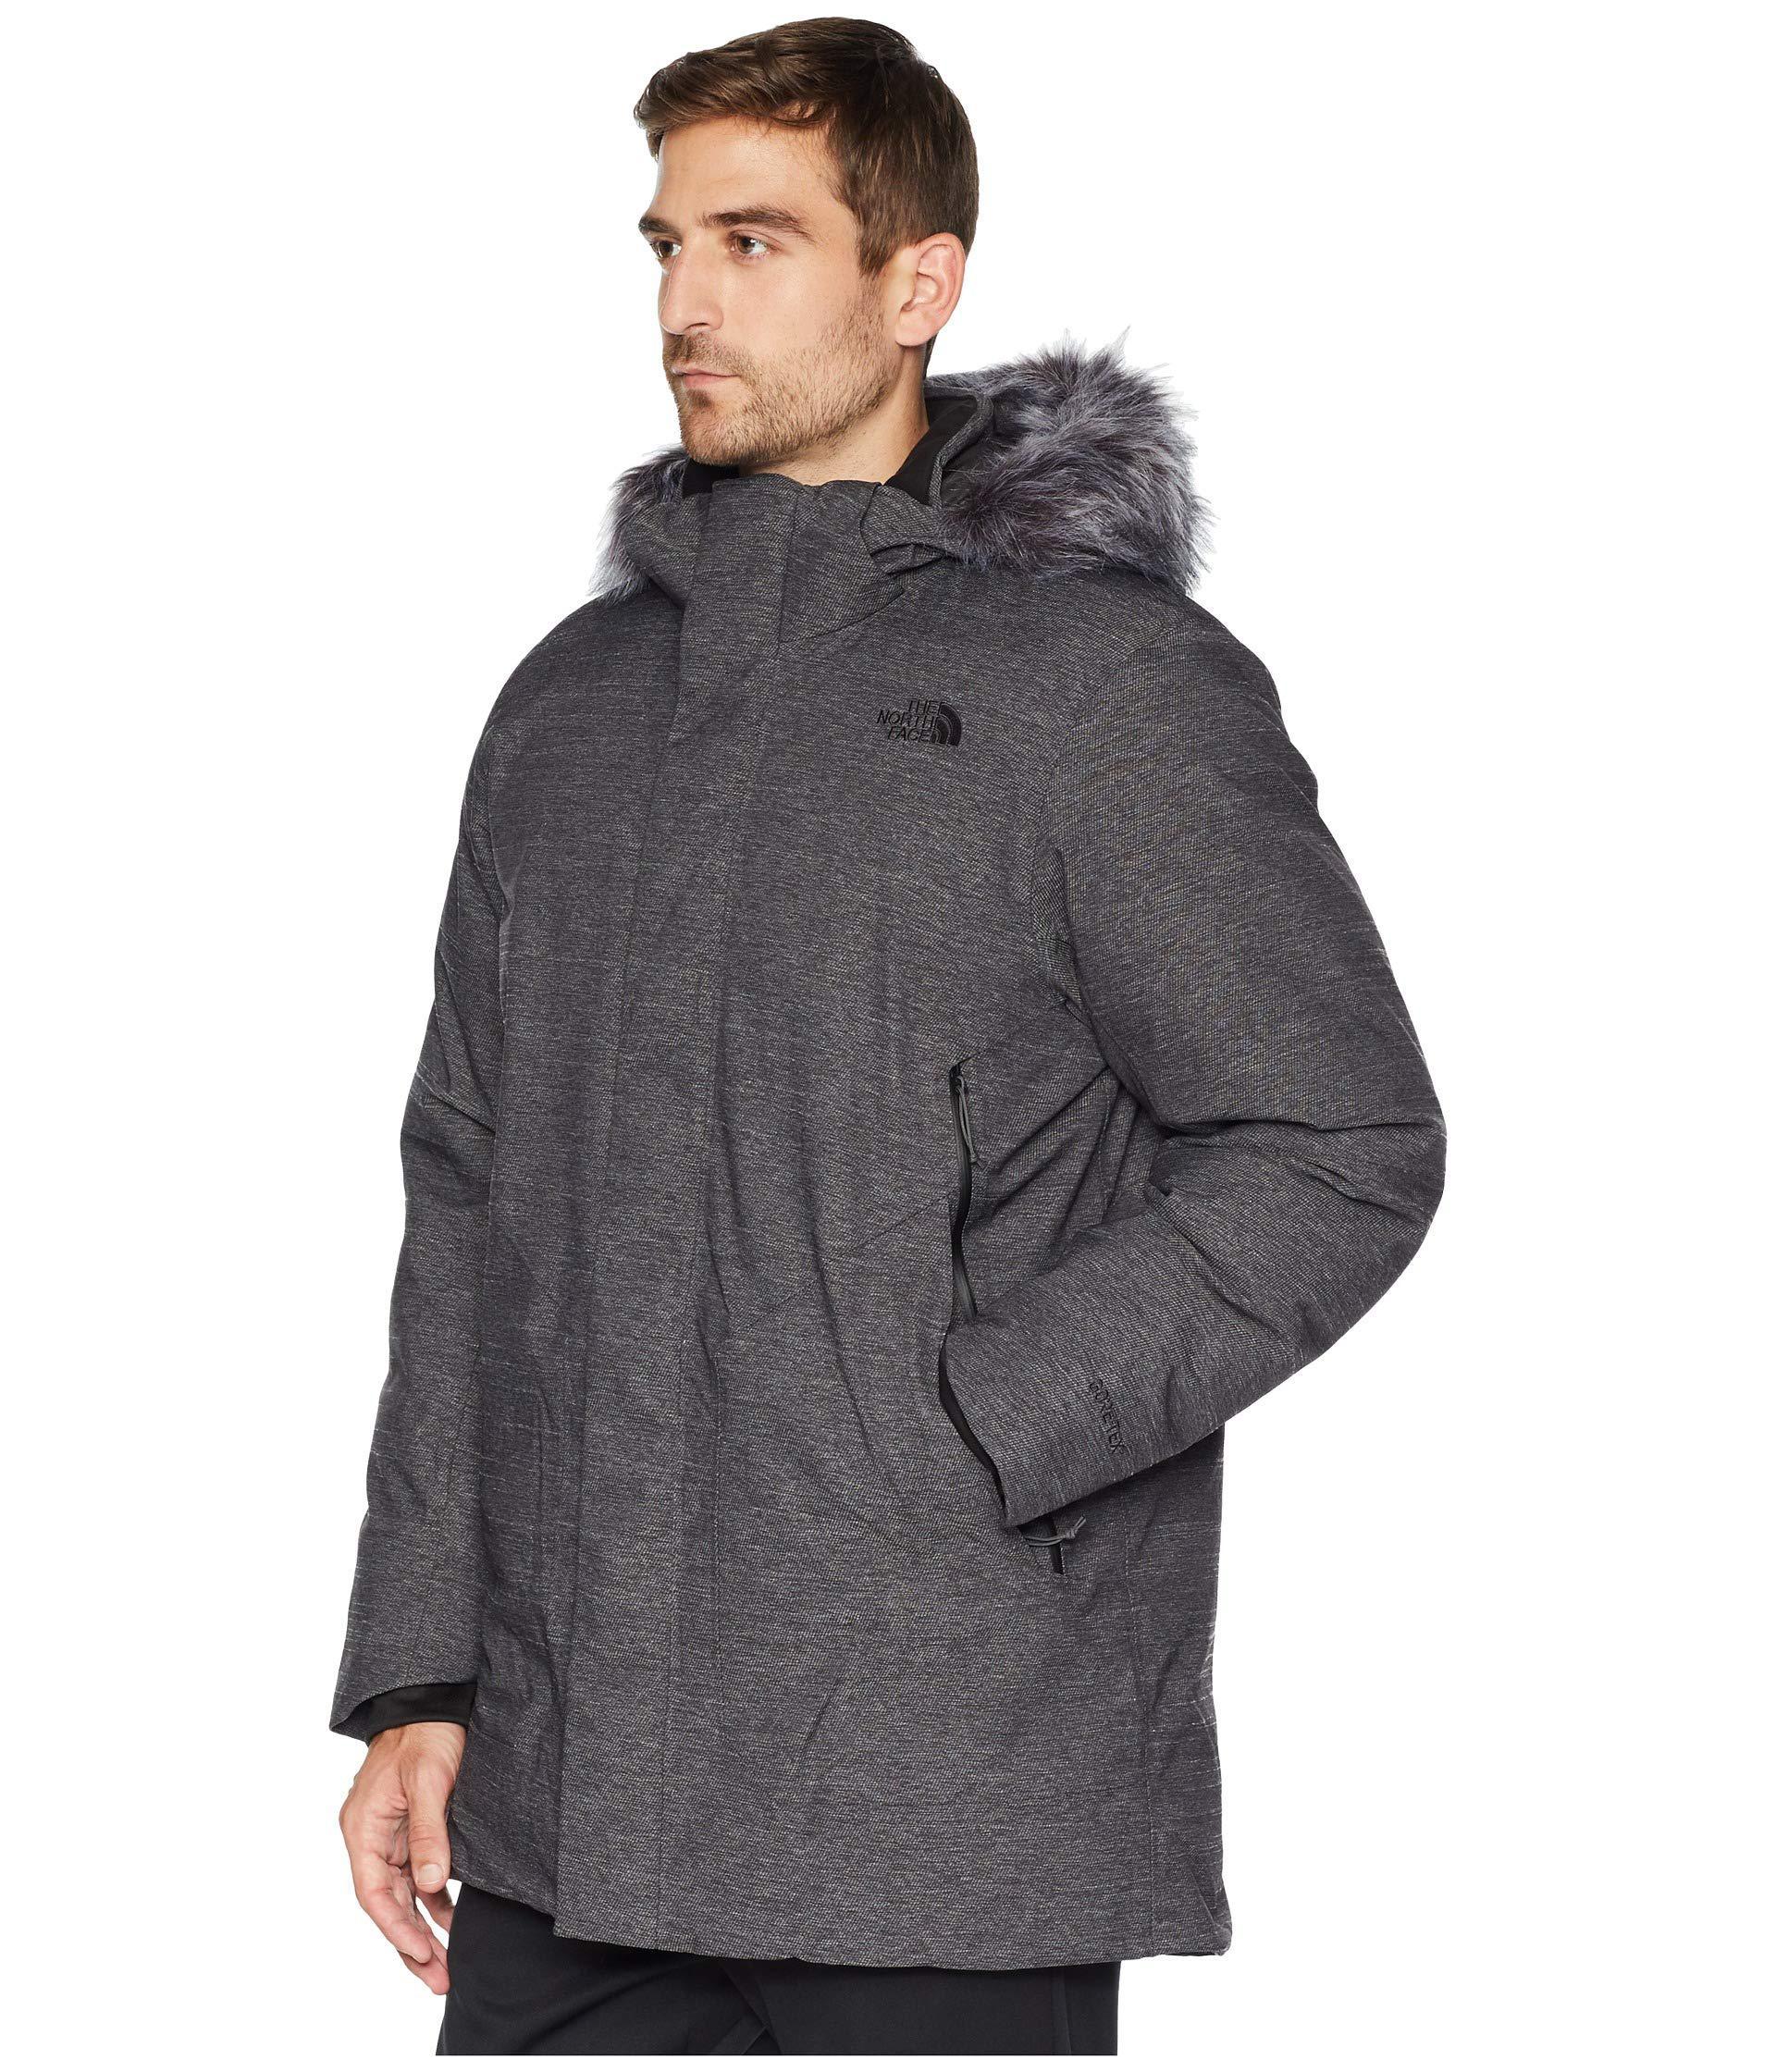 ... netherlands lyst the north face defdown parka gtx urban navy mens coat  in gray for men d1467d220